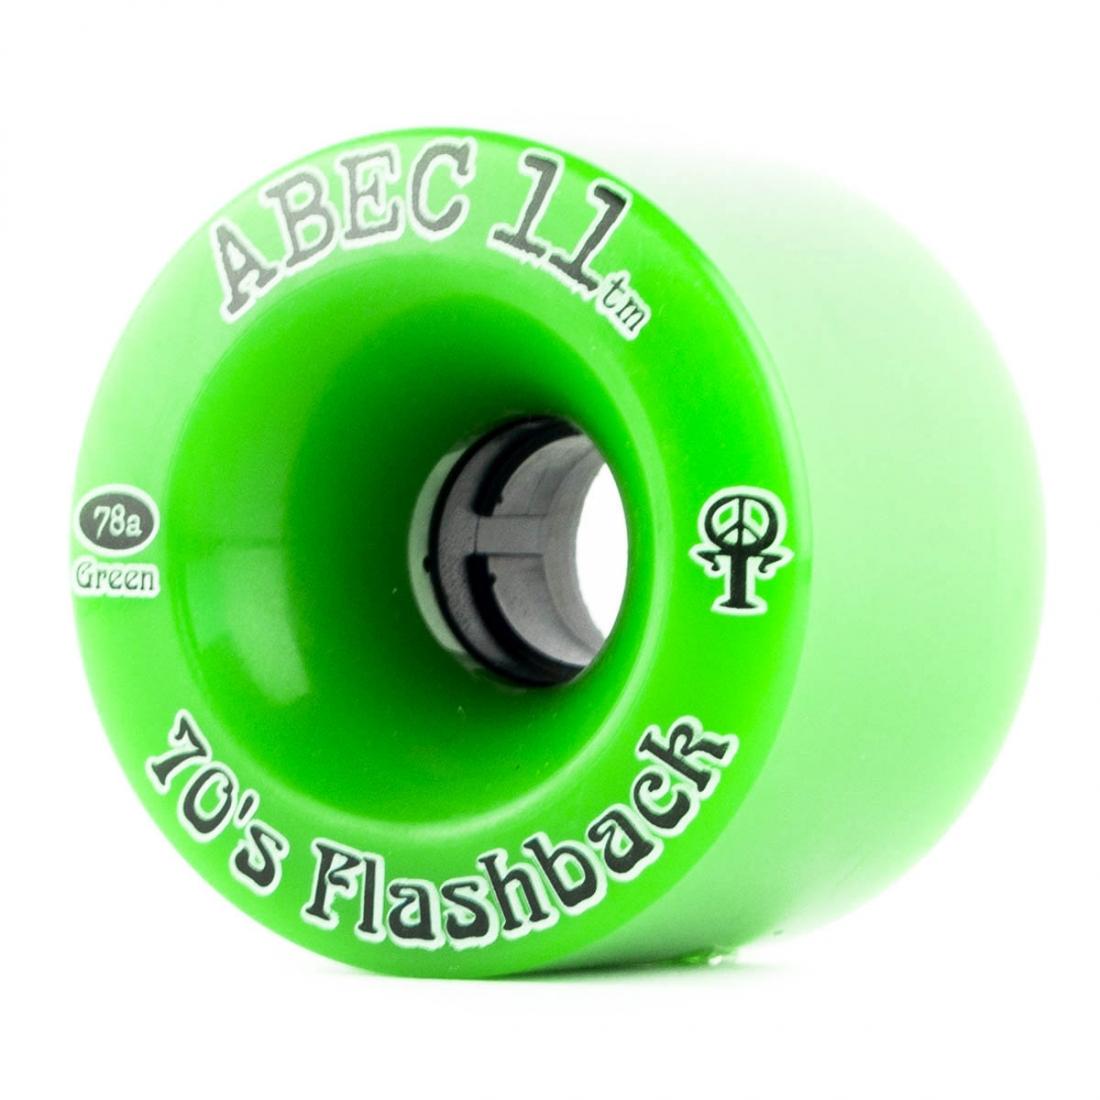 ABEC 11 Flashbacks